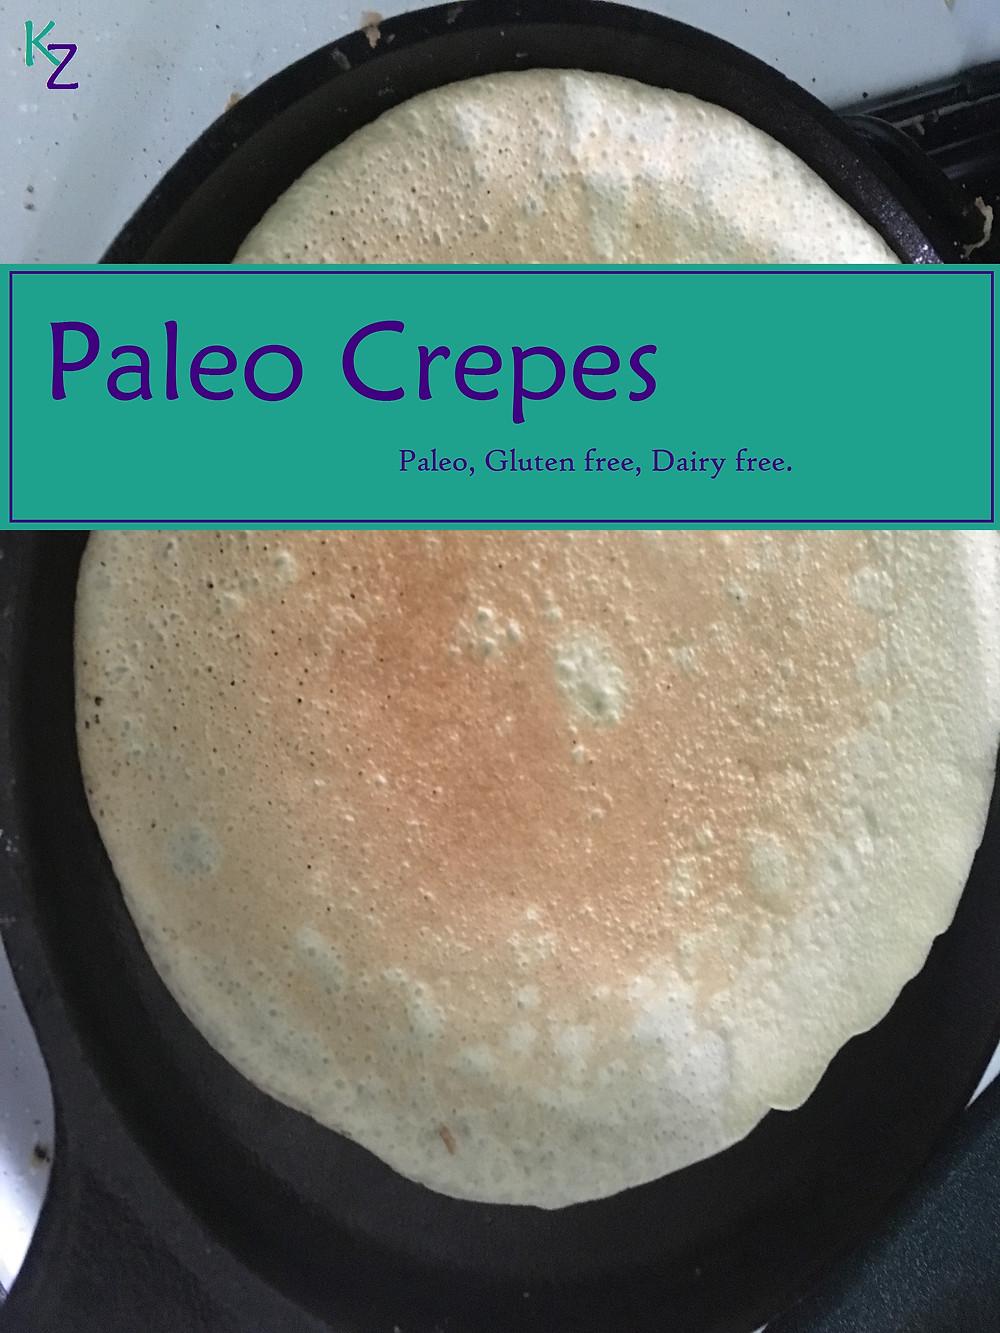 Paleo gluten free dairy free crepe recipe